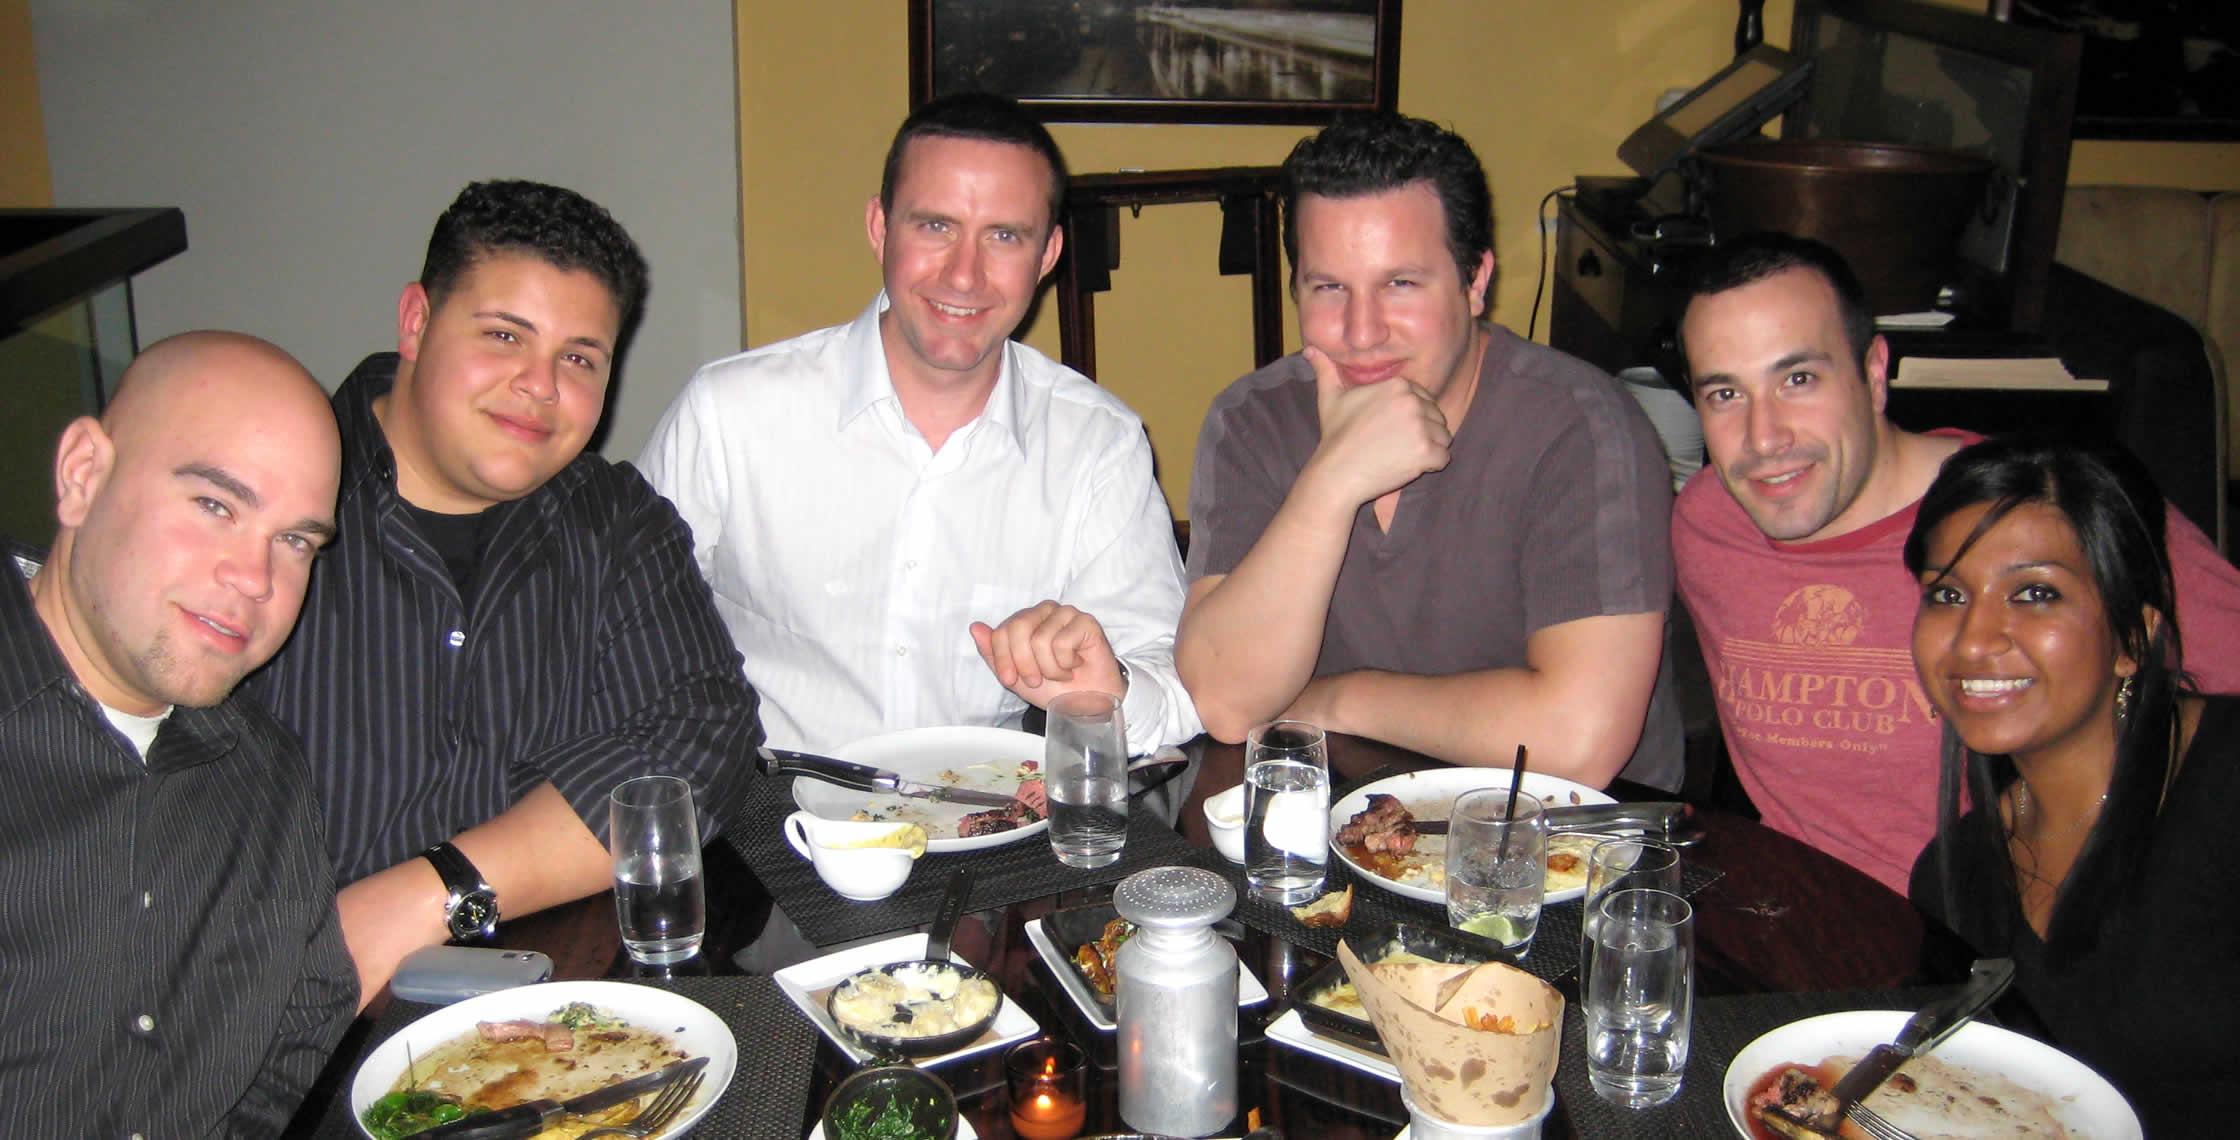 Ben Nadel at the New York ColdFusion User Group (Apr. 2008) with: Clark Valberg, Peter Bell, Rob Gonda, and Nafisa Sabu